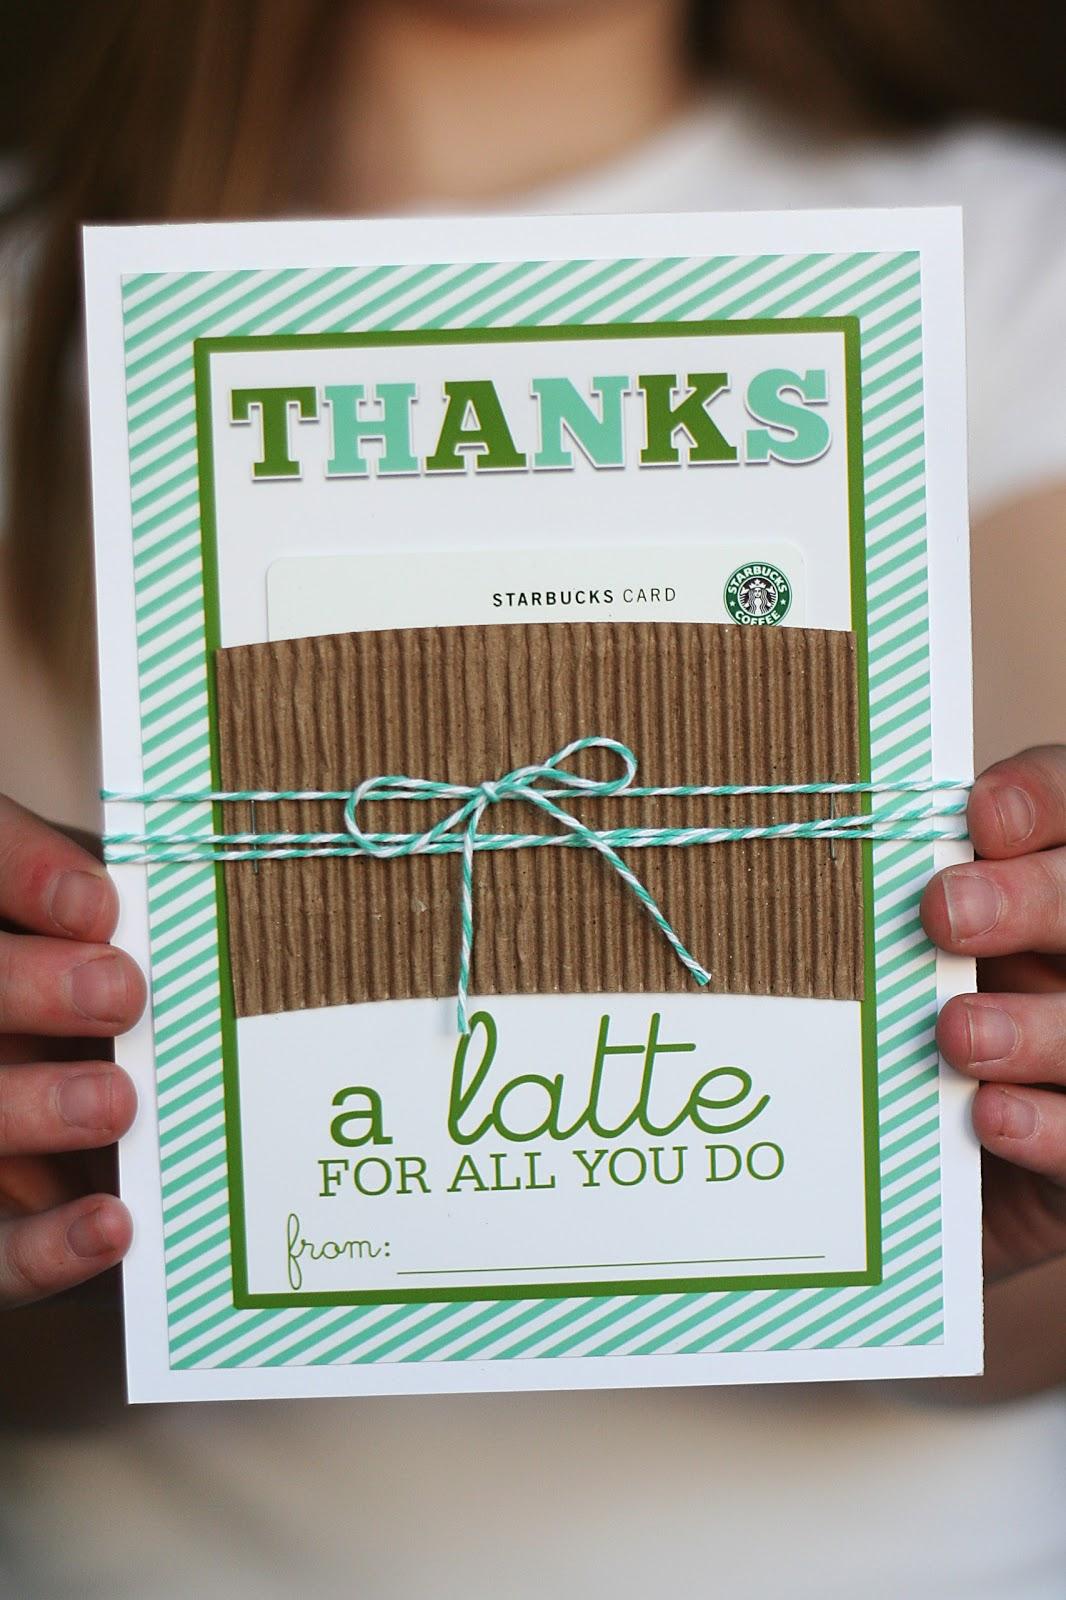 Thanks a latte for all you do | Teacher Appreciation Week Gift Ideas